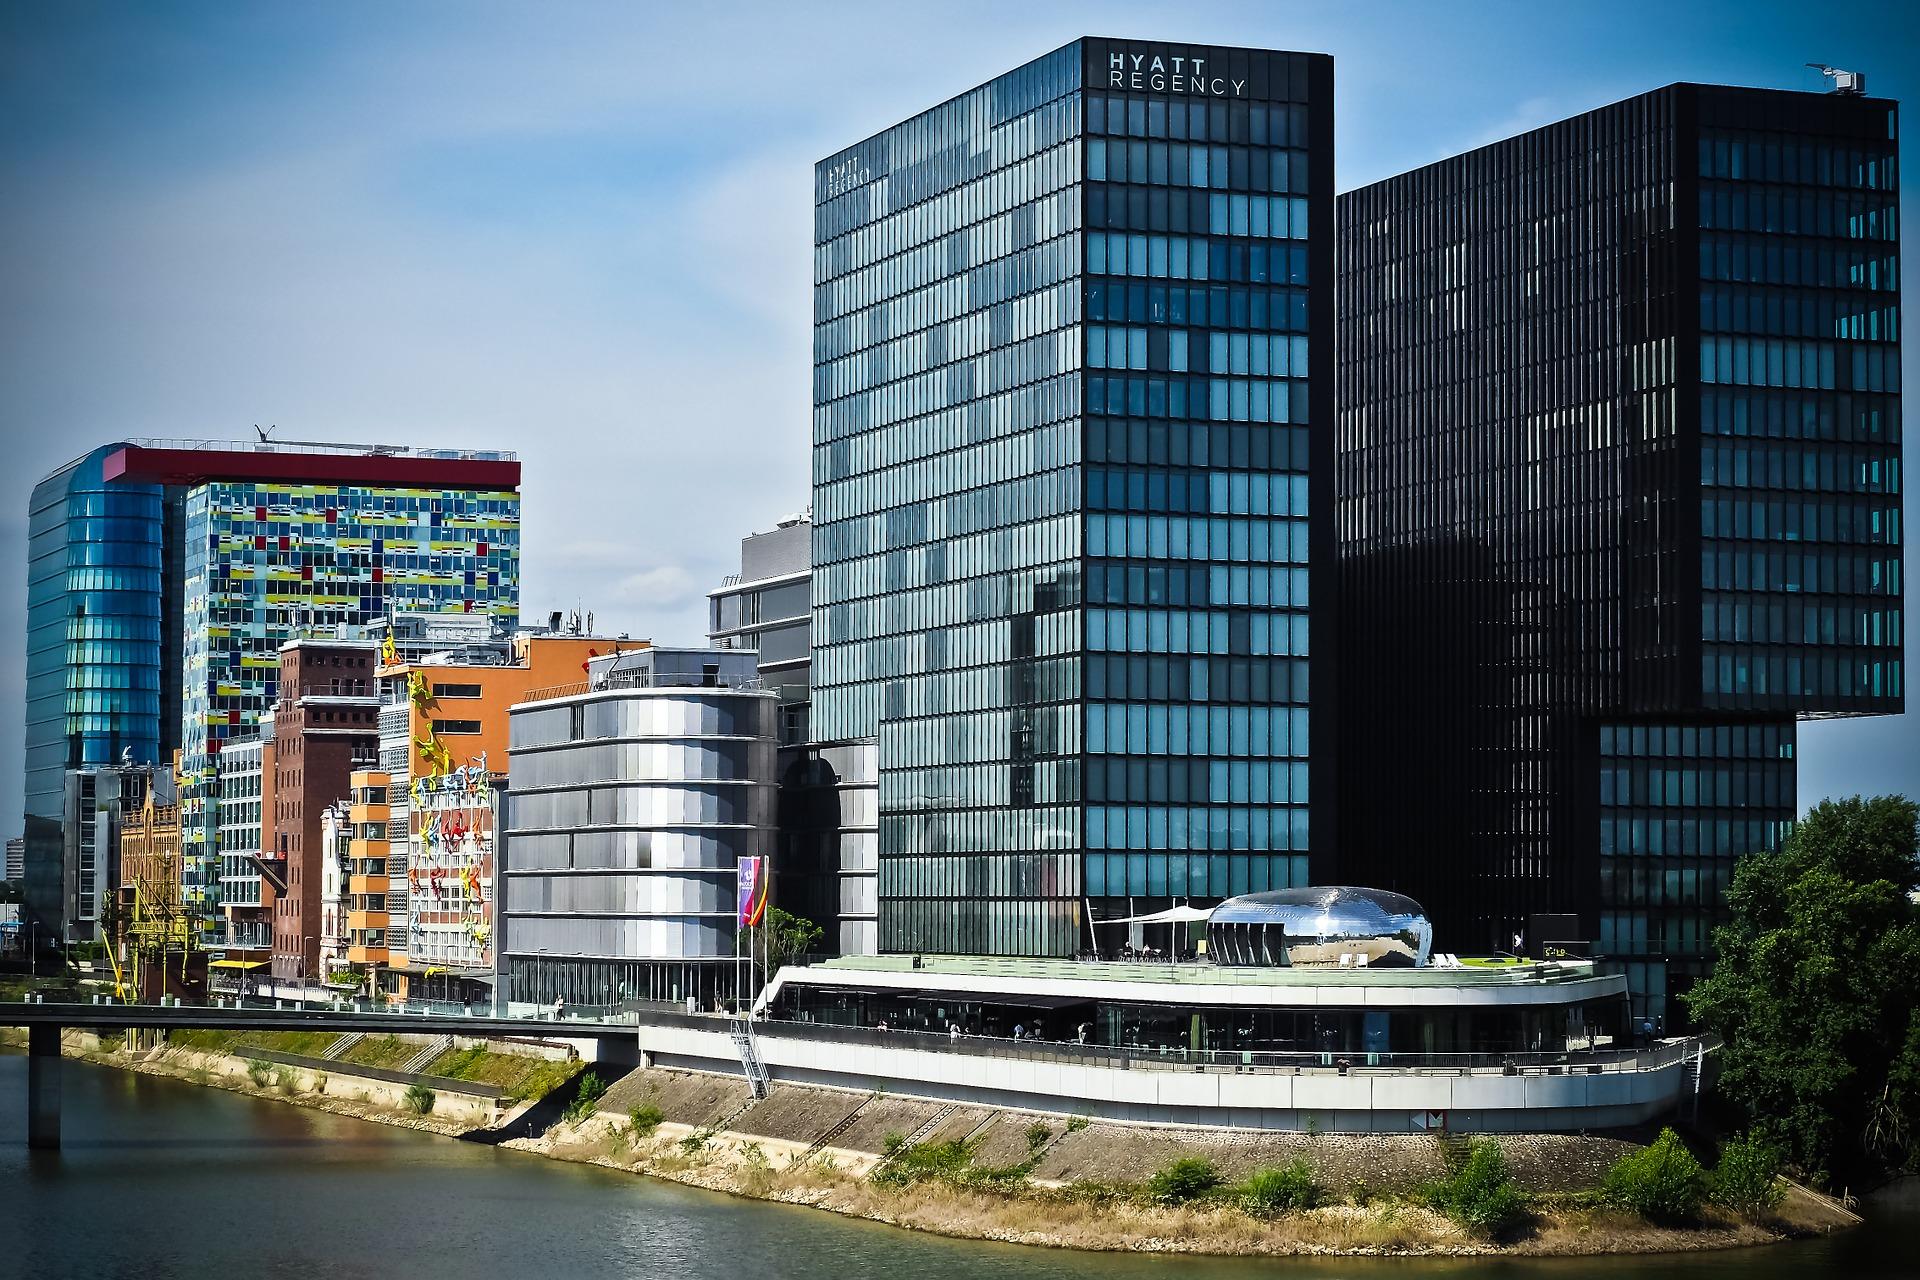 इमारतें, शहर, वास्तुकला, पोर्ट, डसेलडोर्फ - HD वॉलपेपर - प्रोफेसर-falken.com